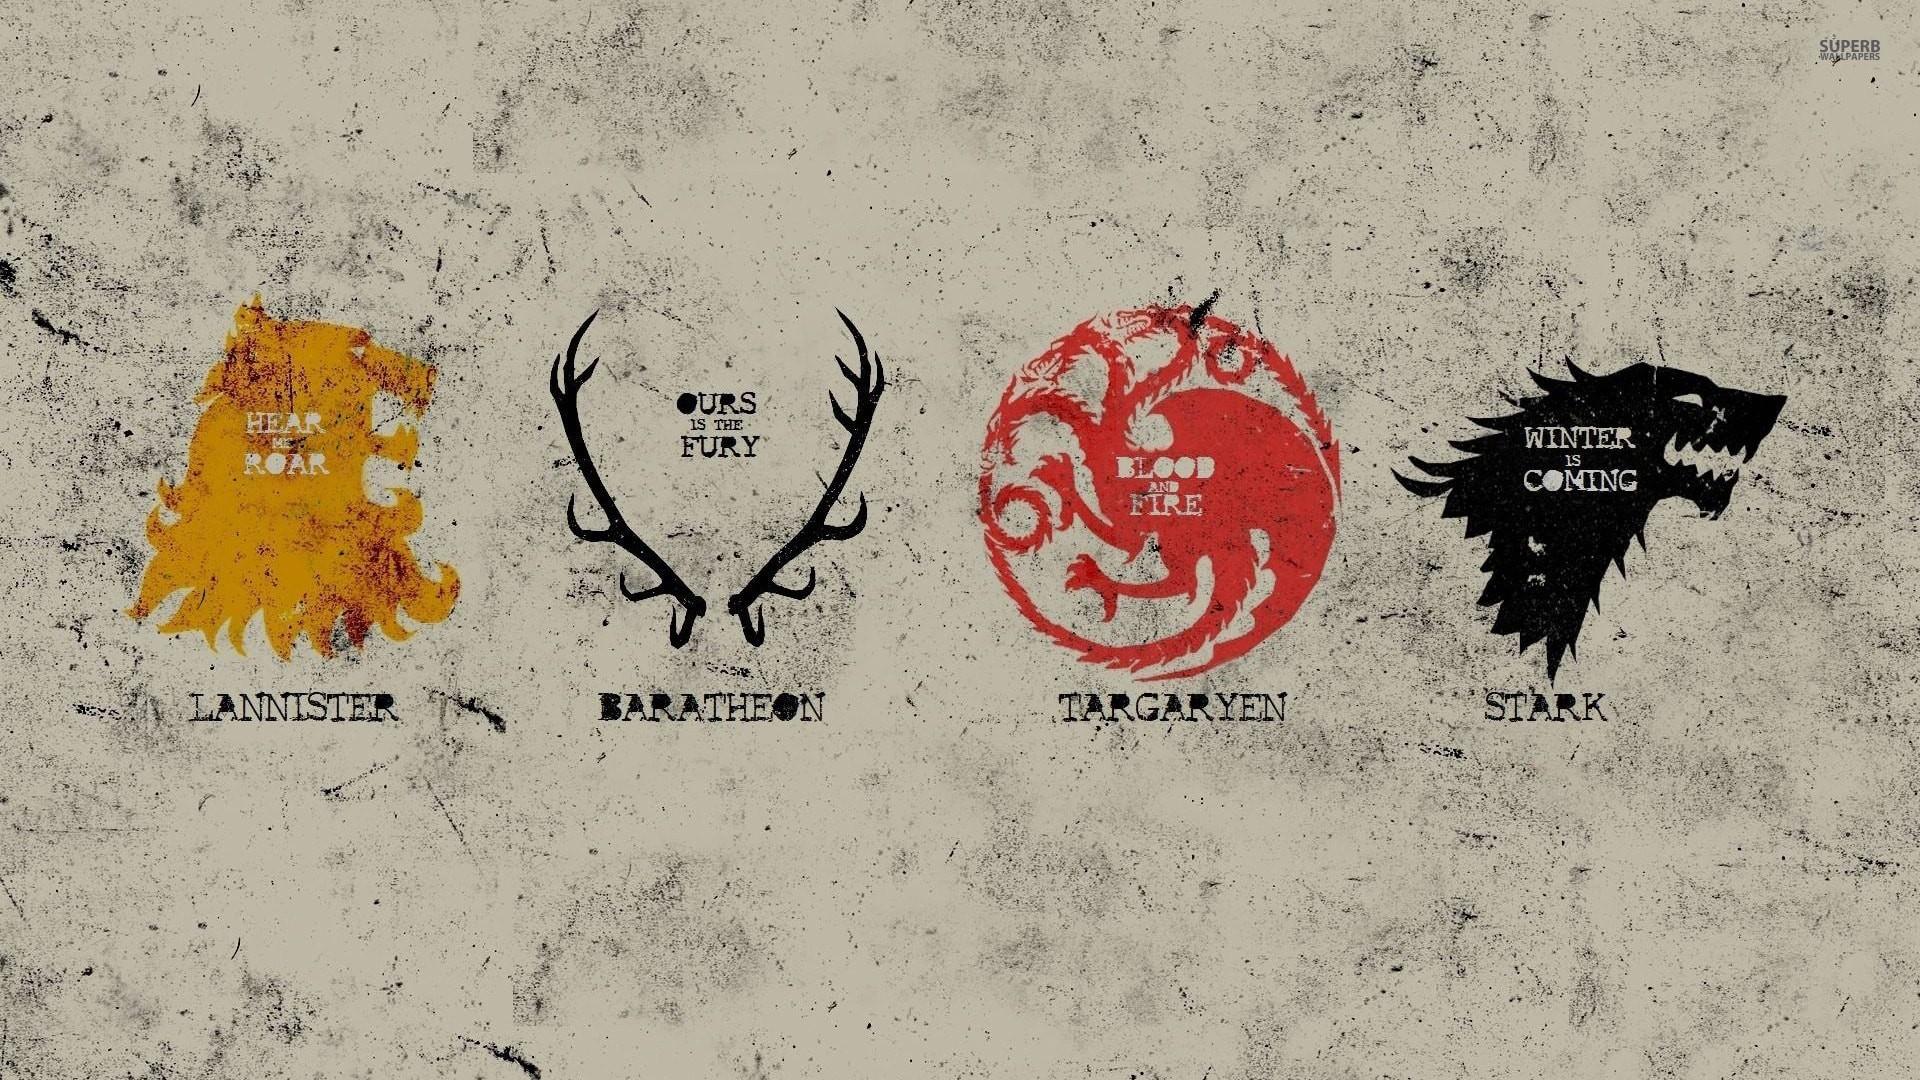 Game of Thrones HD wallpaper ·① Download free beautiful ...